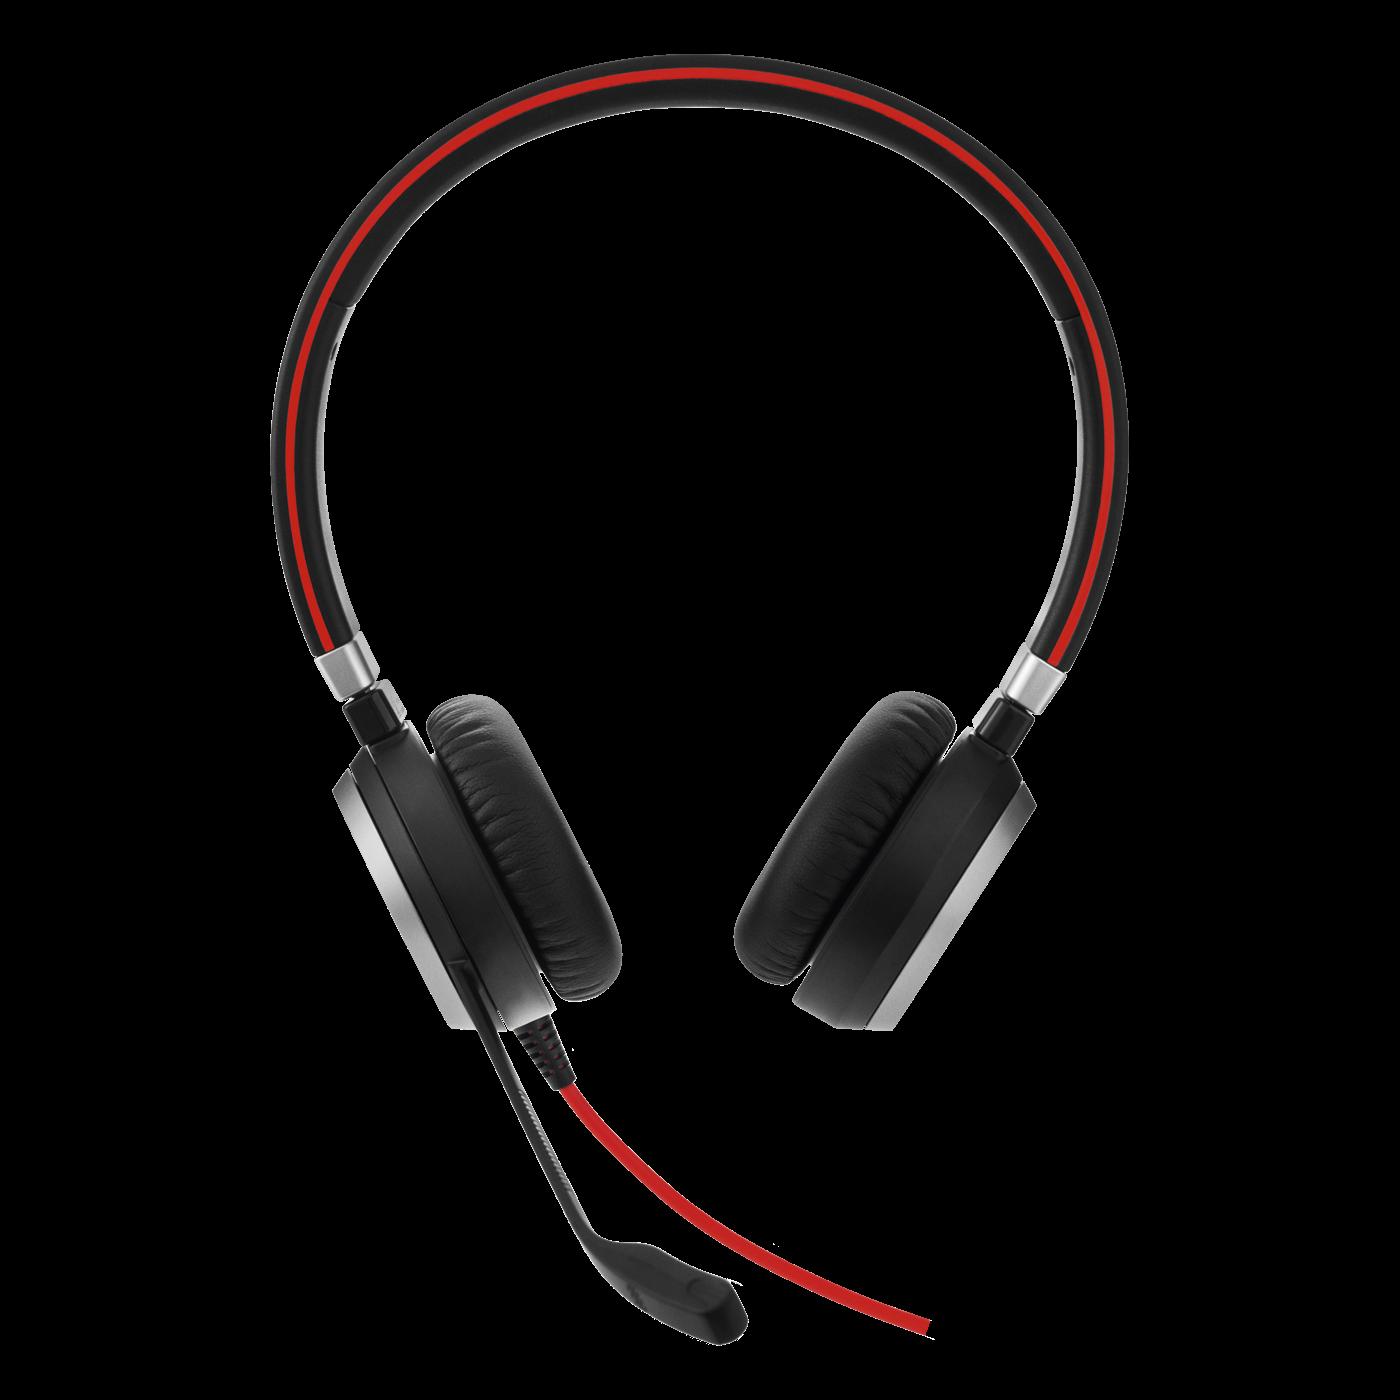 jabra evolve 40 headset with quality microphone rh jabra com Aviation Headset Jack Wiring Helicopter Headset Jack Wiring